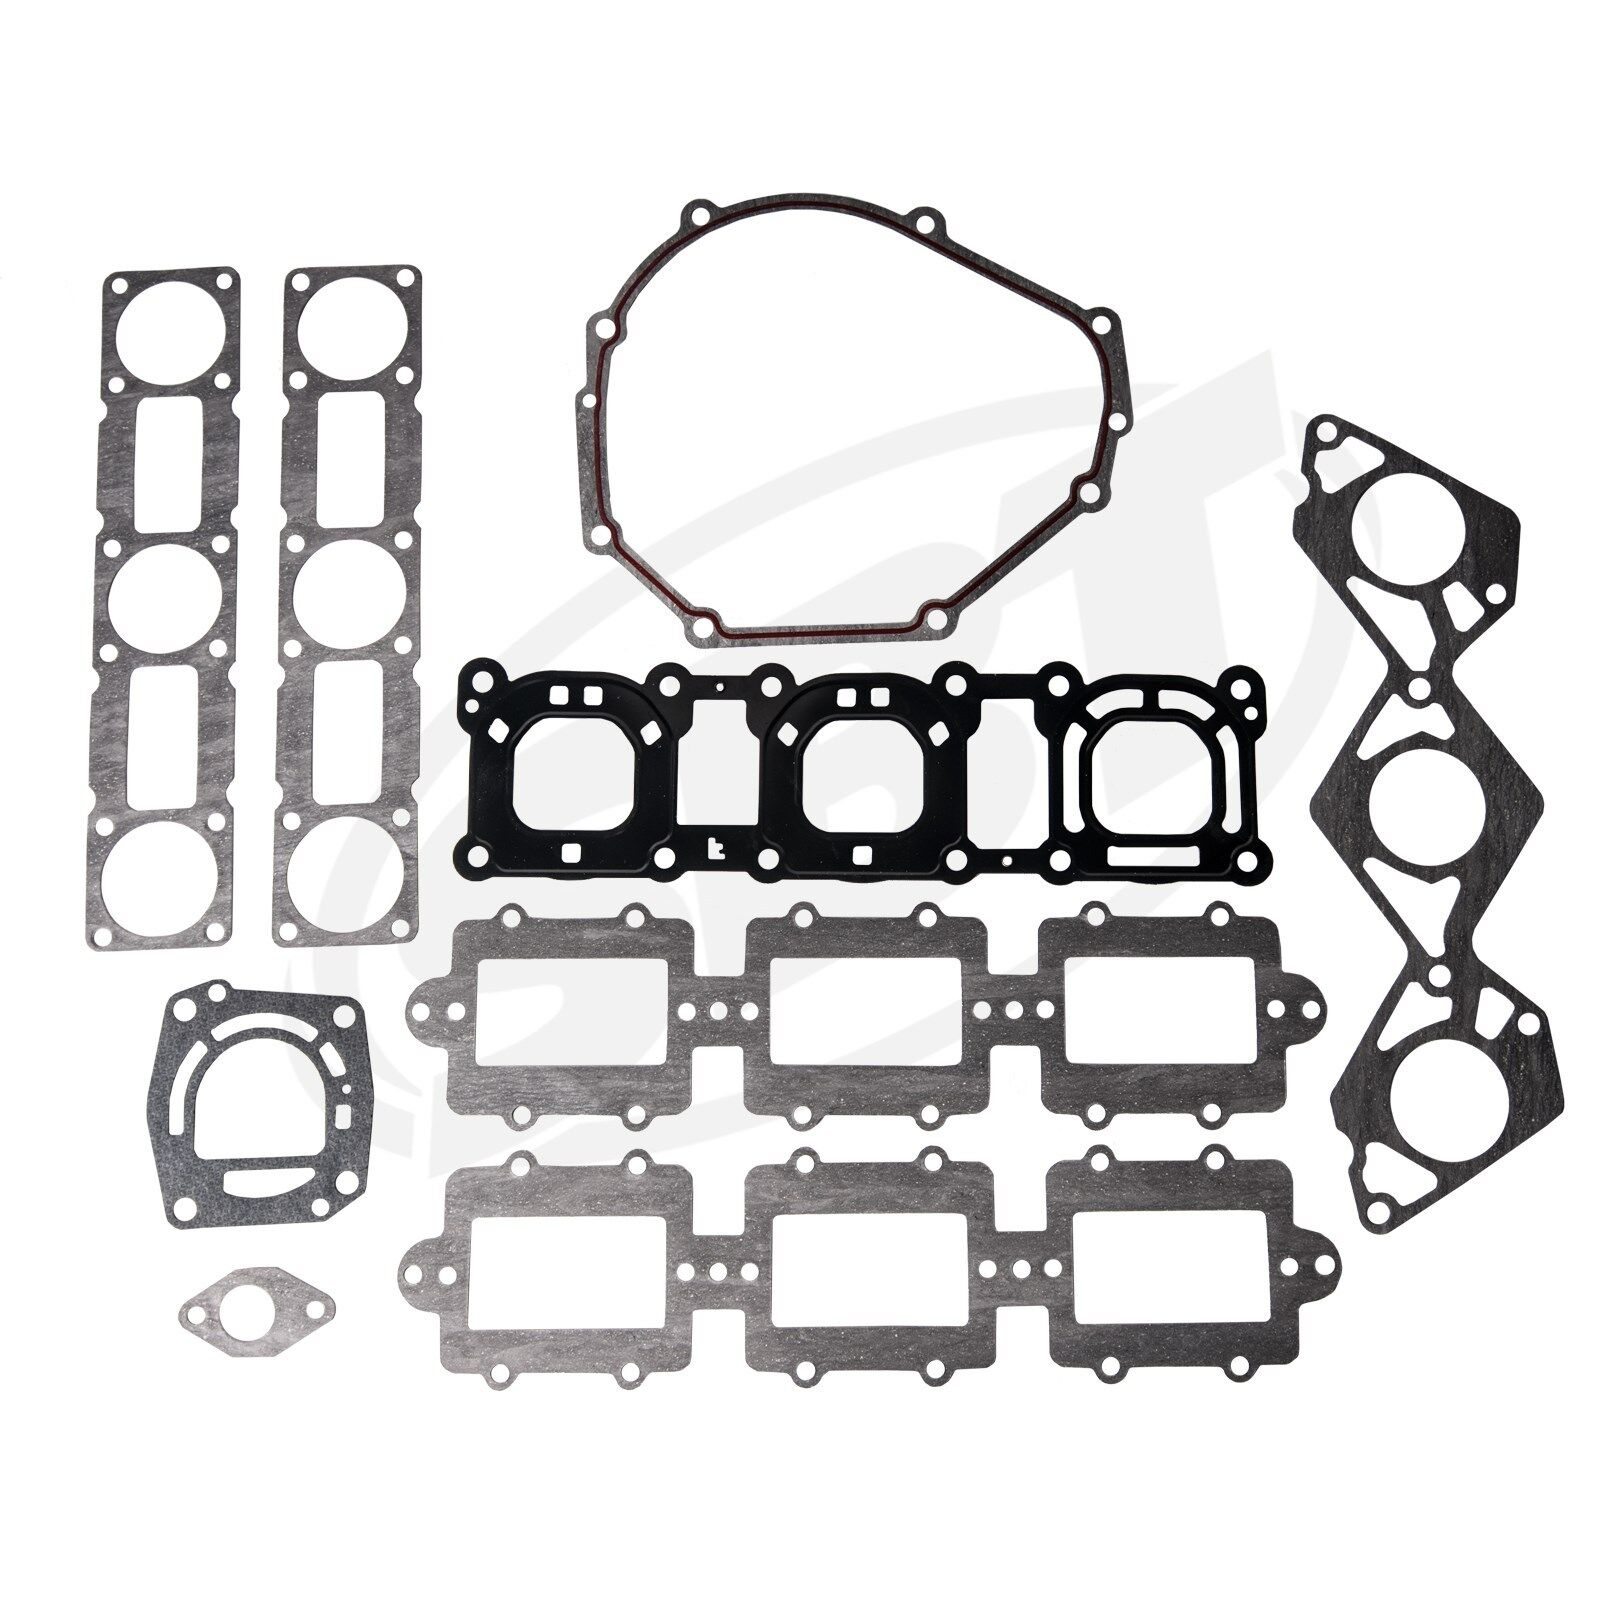 Yamaha Installation Gasket Kit 1200 Non PV GP1200 XL1200 SUV 97 98 2000 2001 02